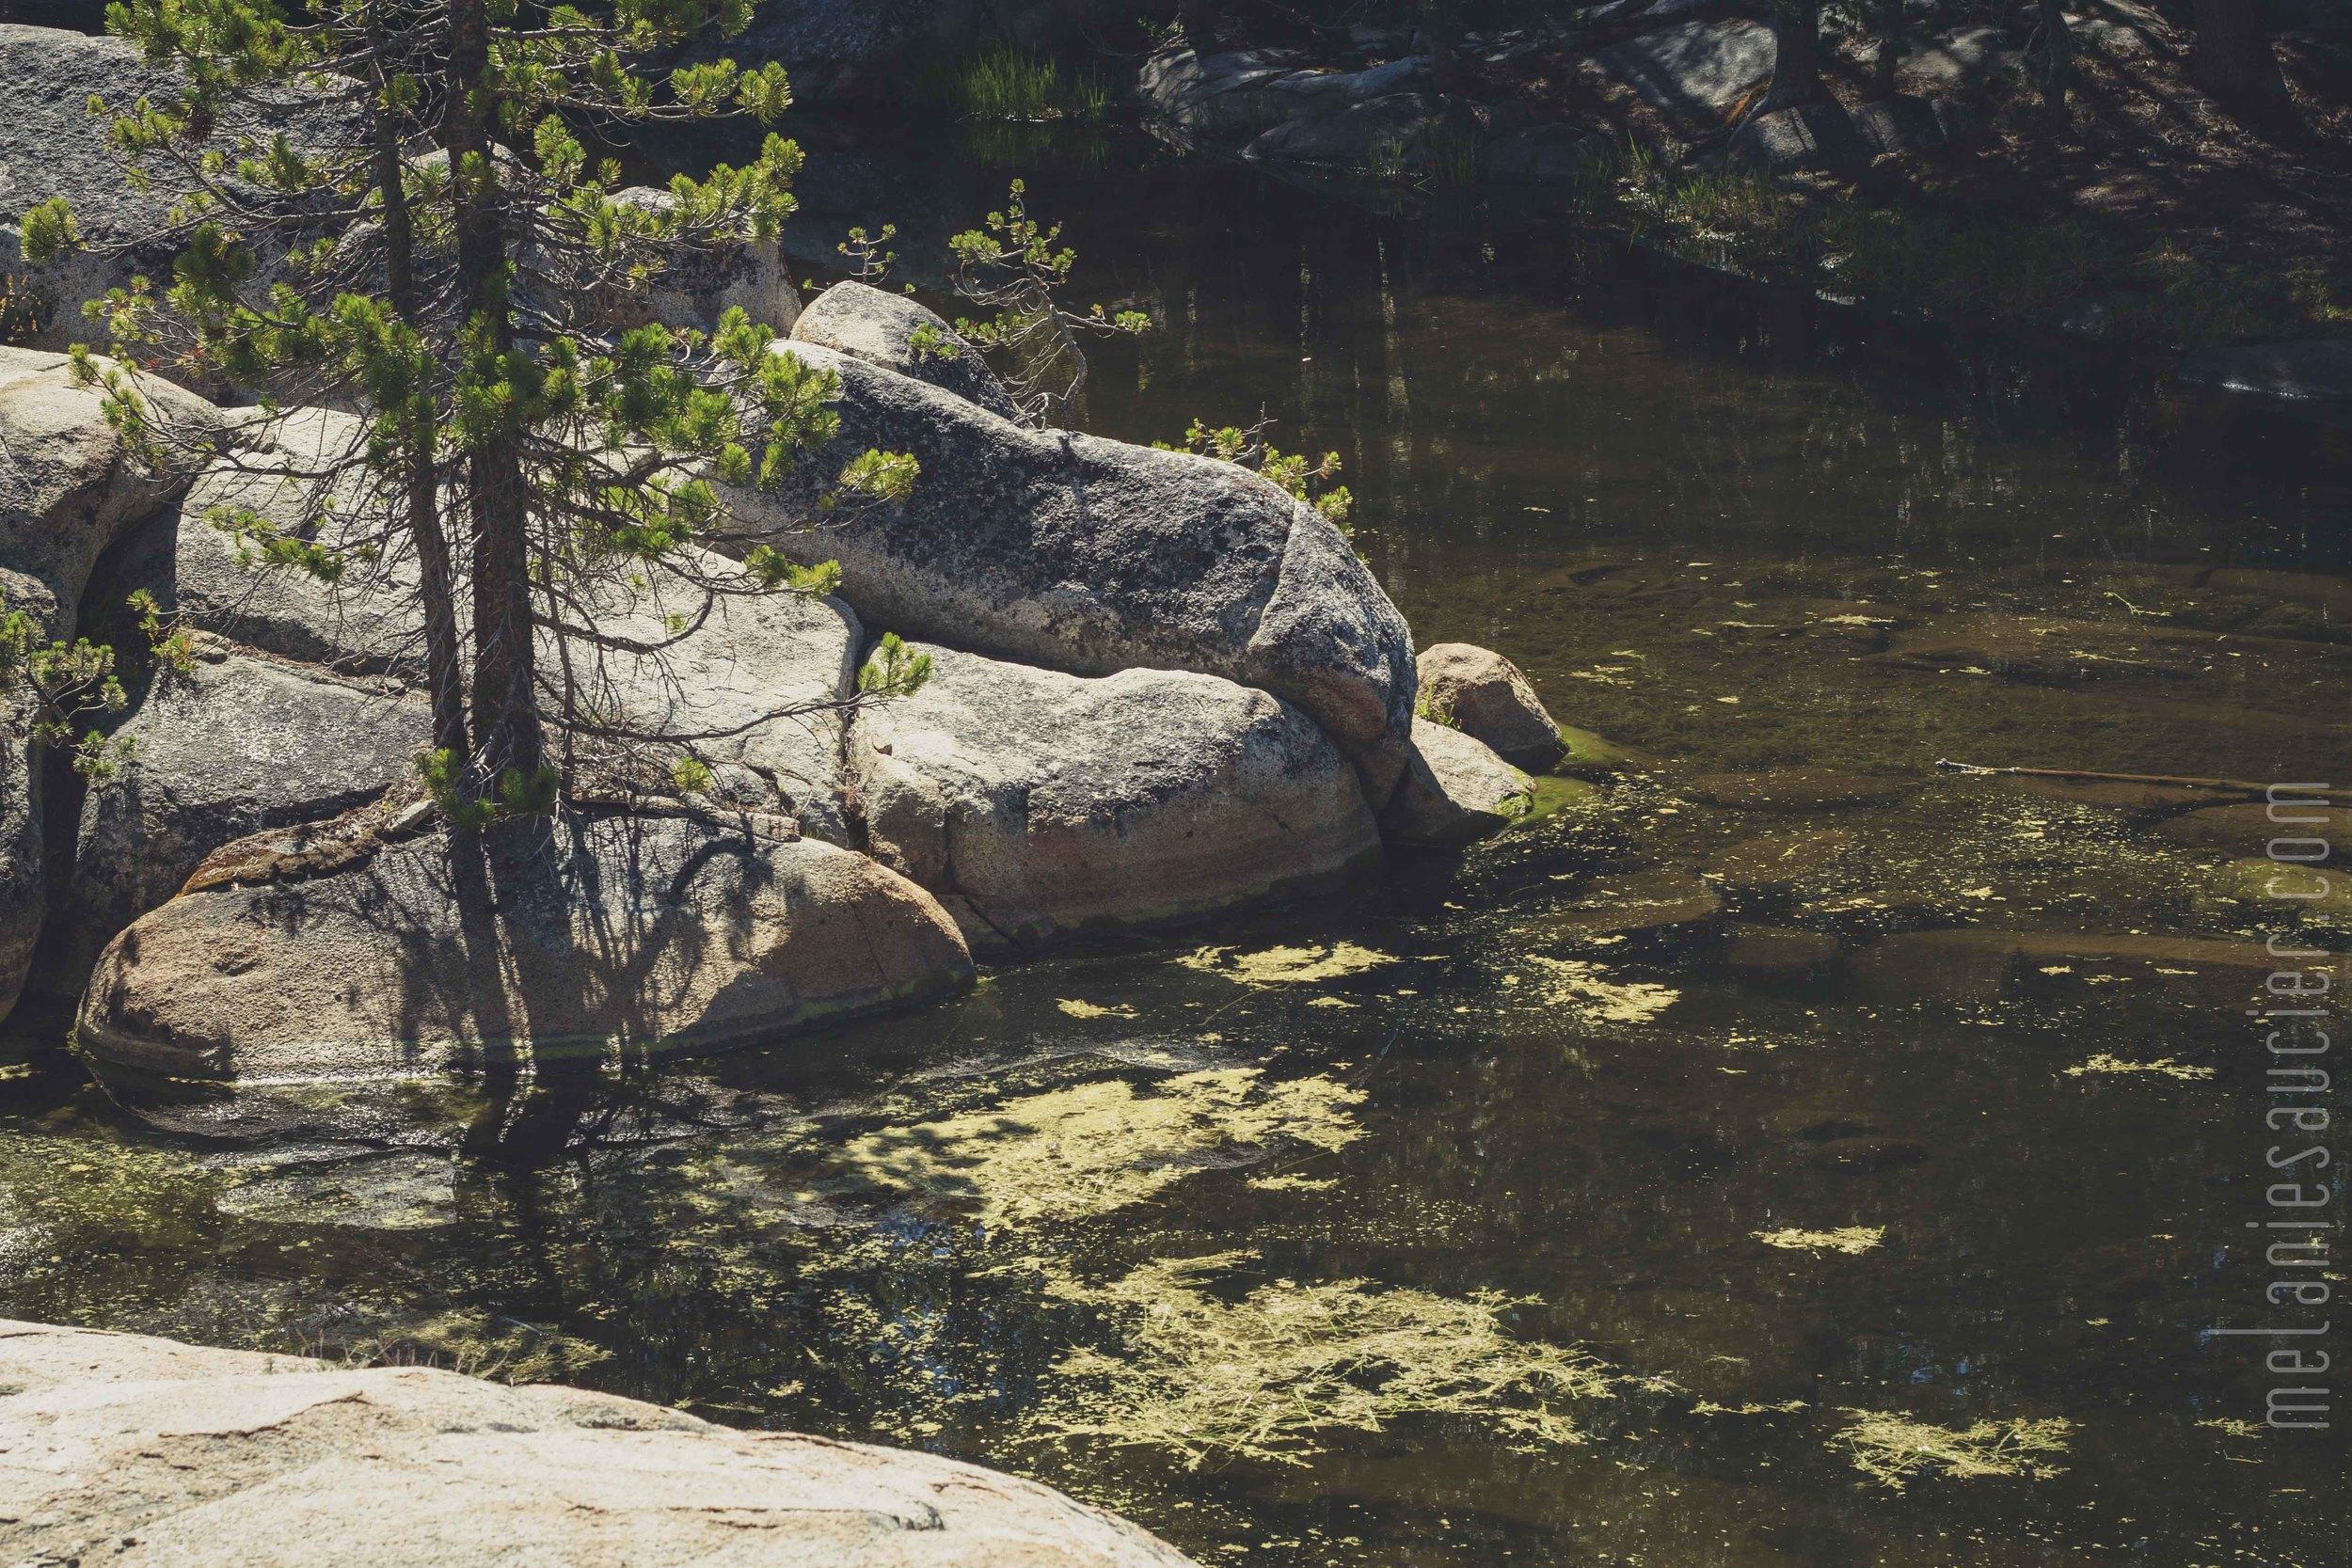 Utica_Reservoir_NorCal-79.jpg